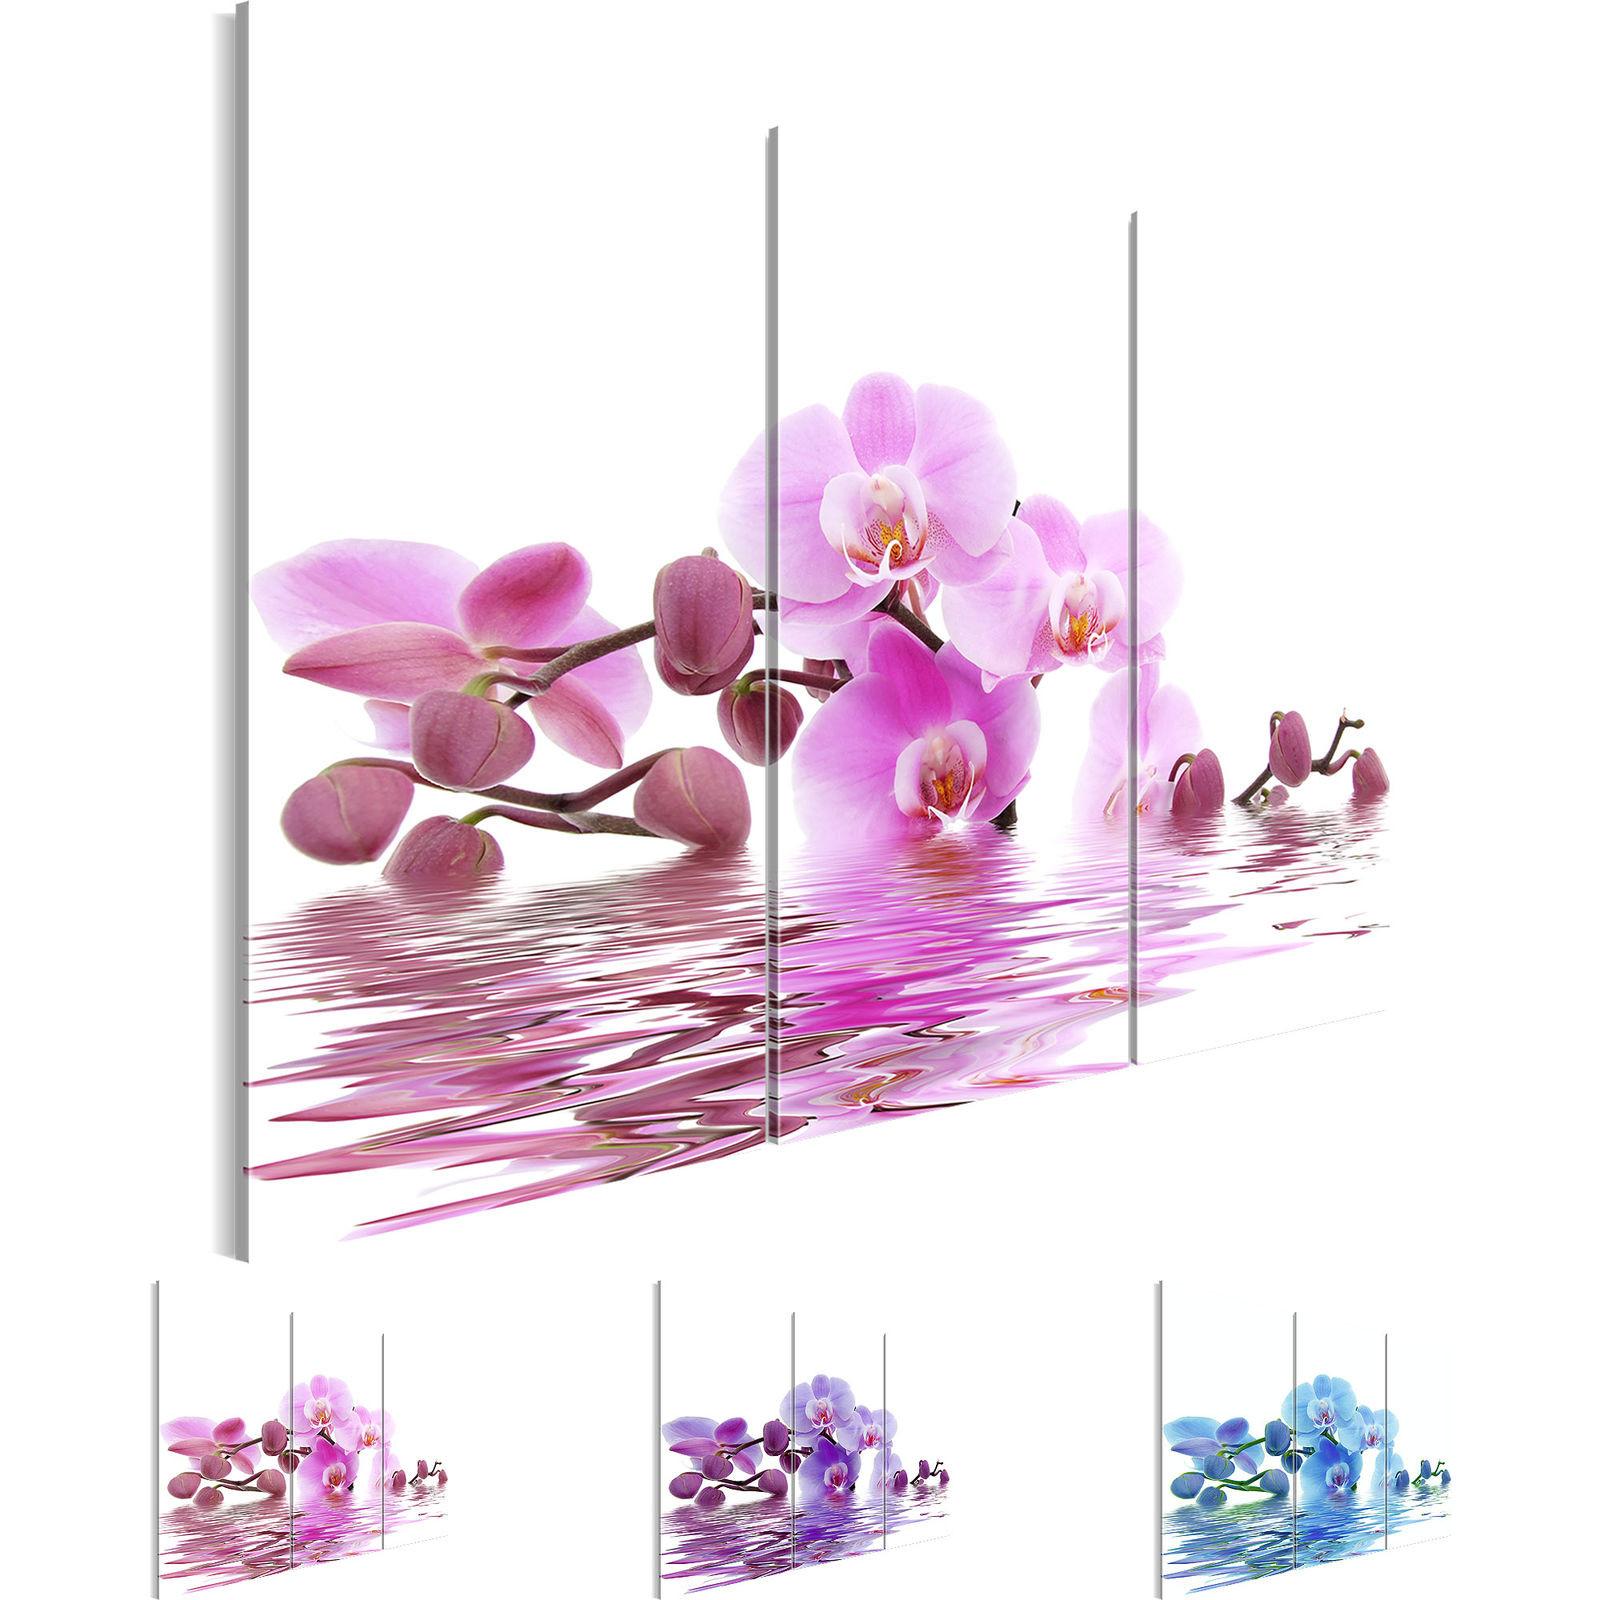 Wandbilder Xxl Bilder Blumen Orchidee Vlies Leinwand Bild Kunstdruck p